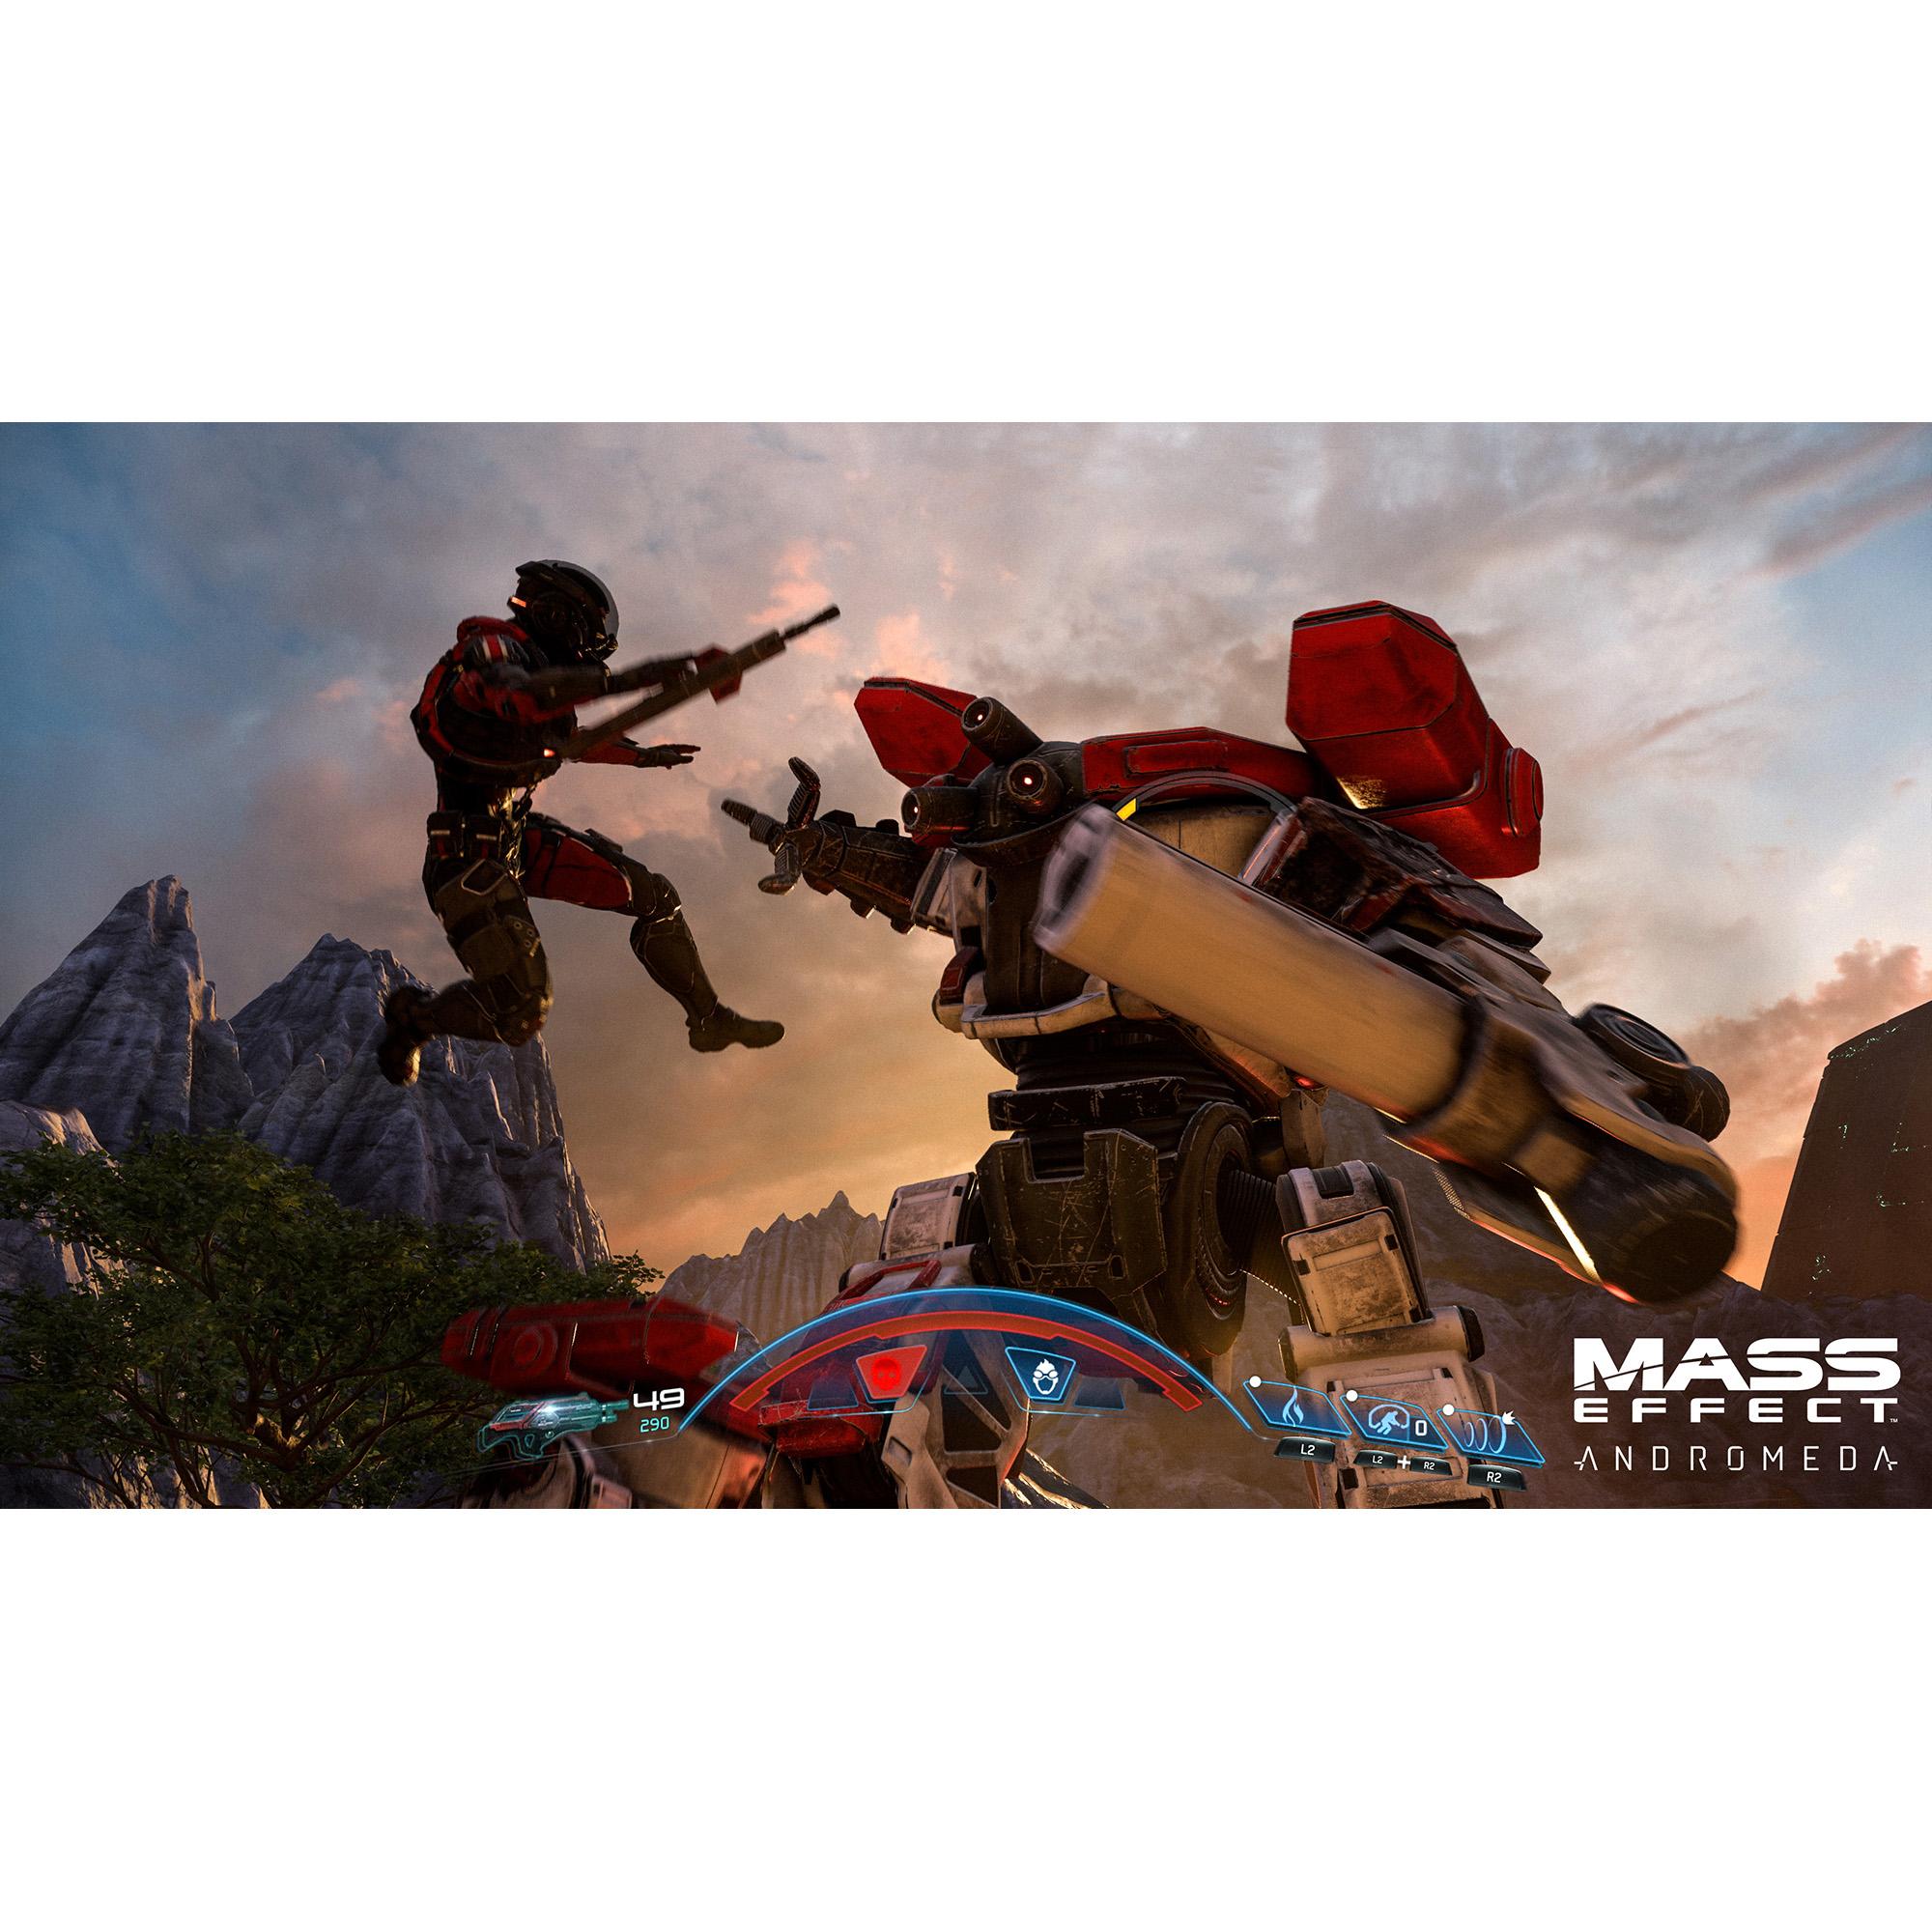 Joc Mass Effect: Andromeda pentru Xbox One 8